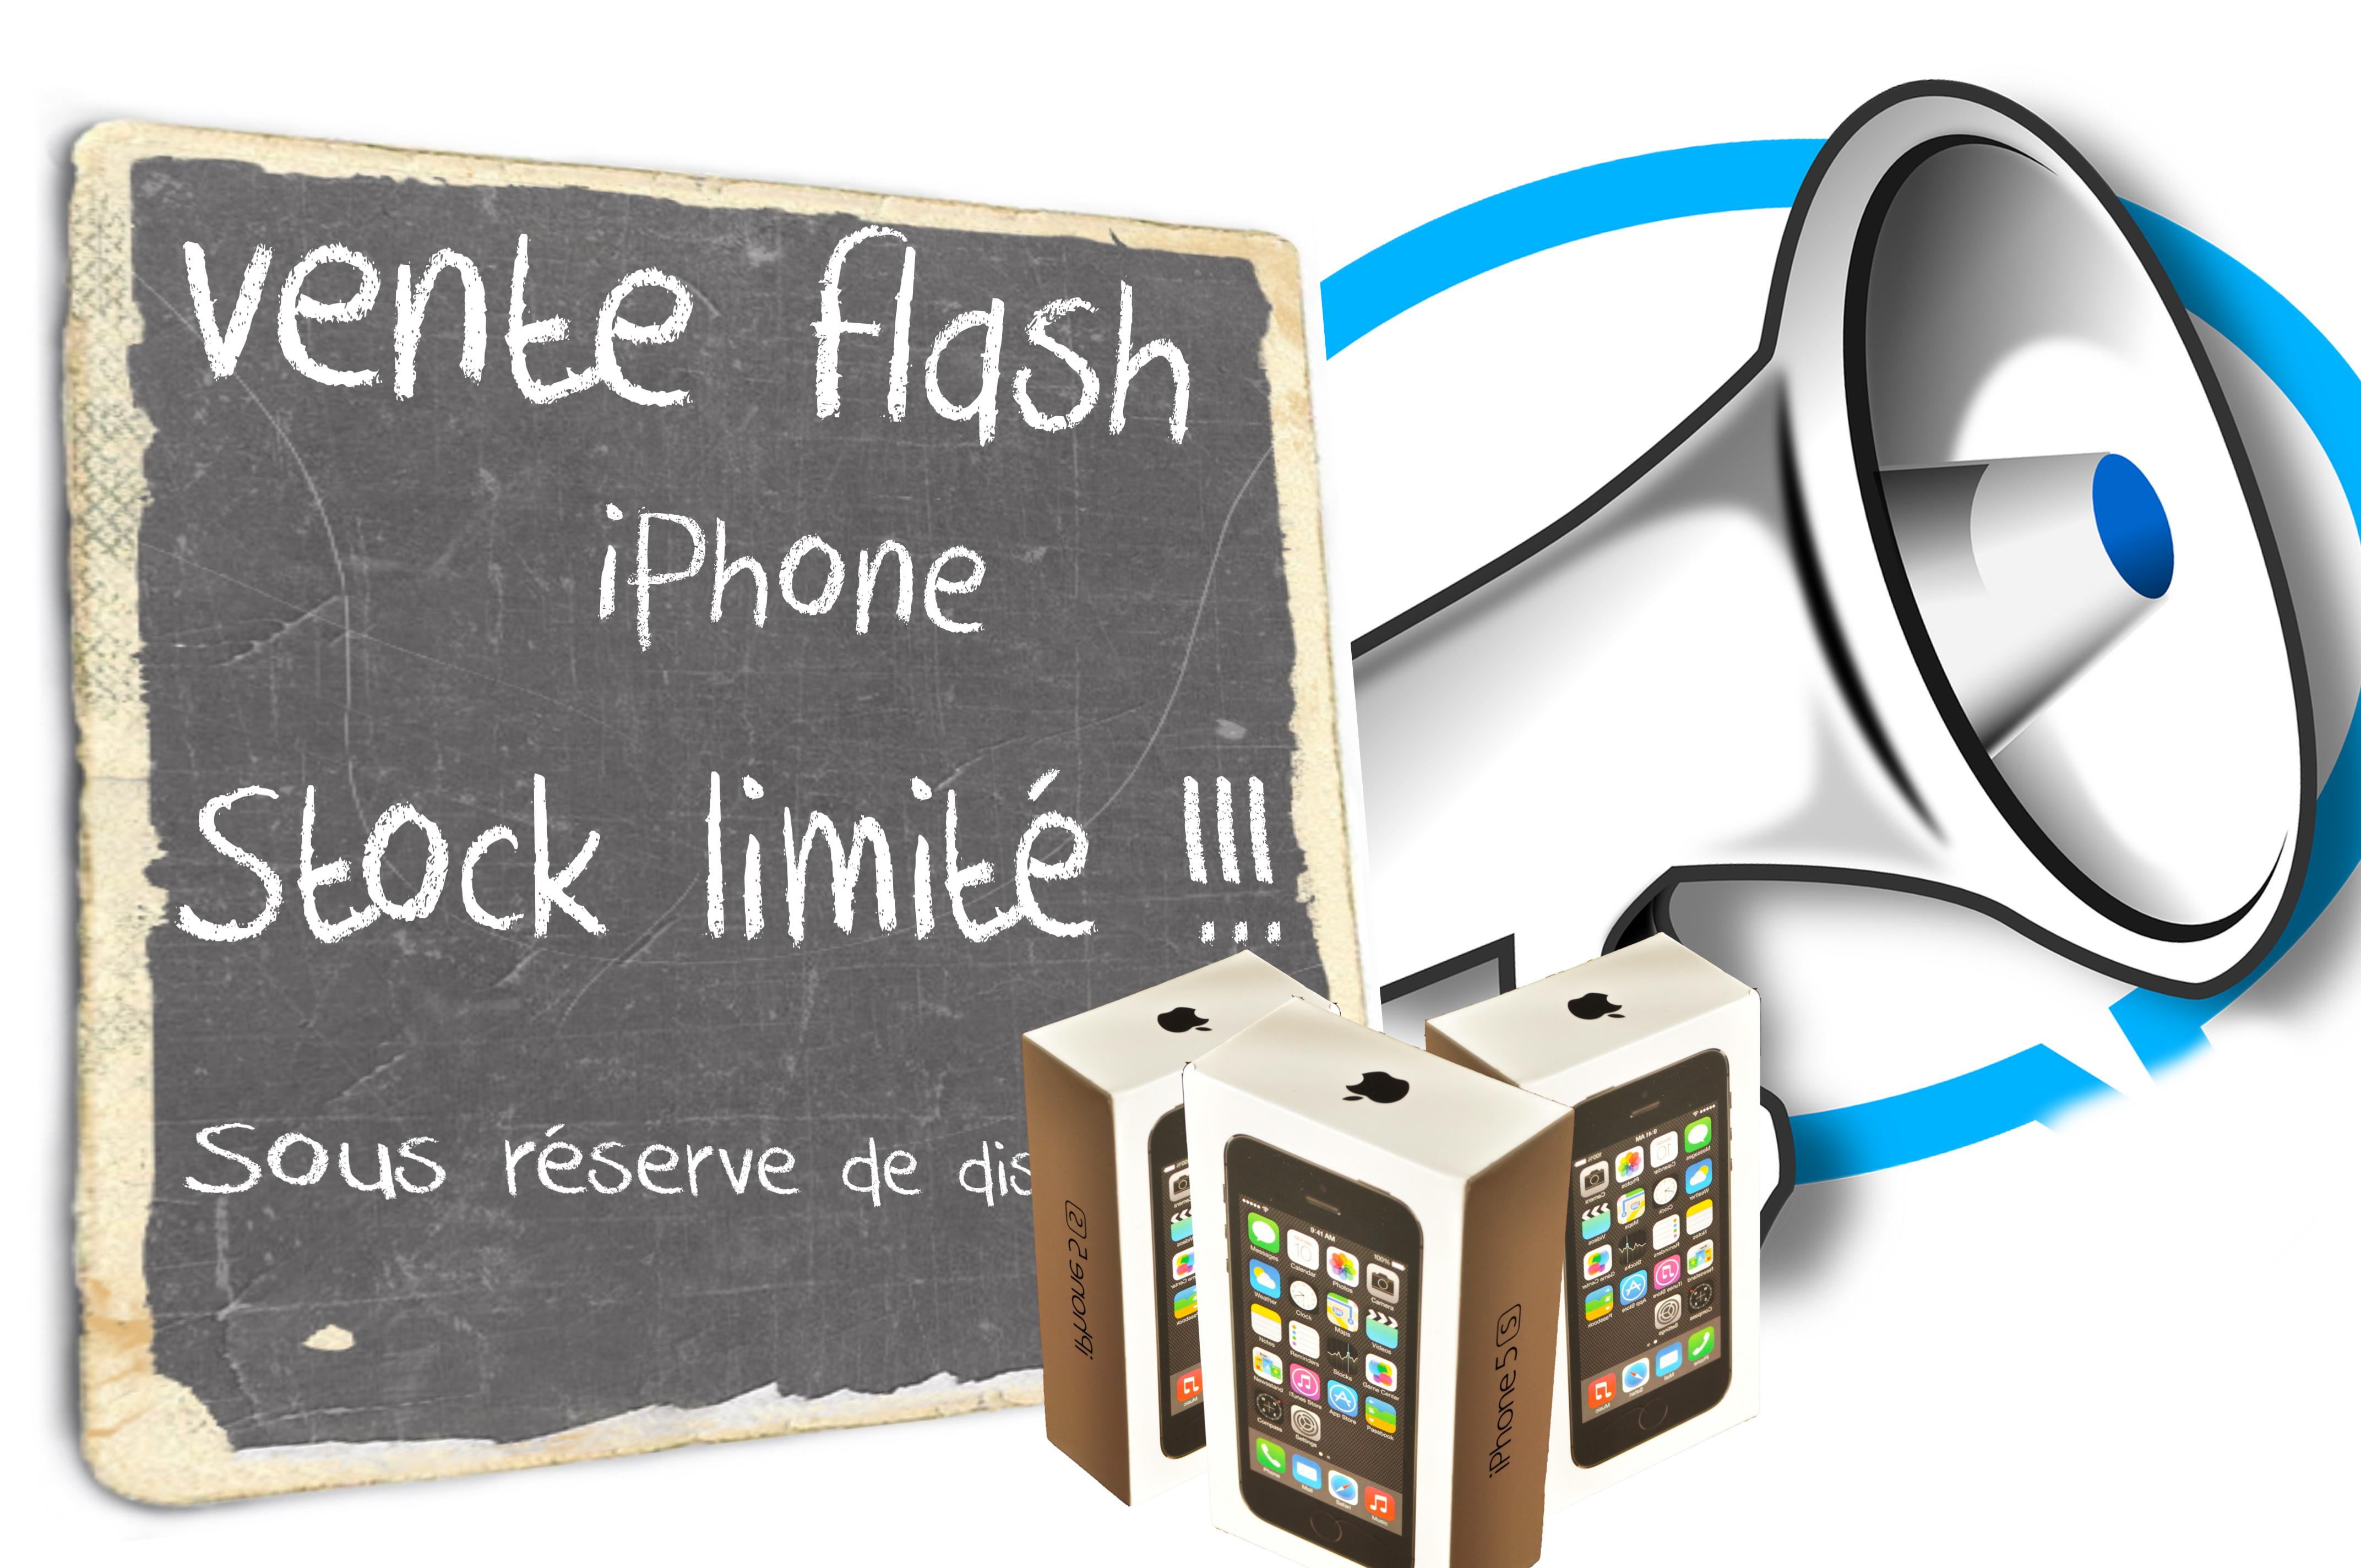 Vente flash smartphone 27 octobre 2015 clinic informatique - Vente flash telephone ...